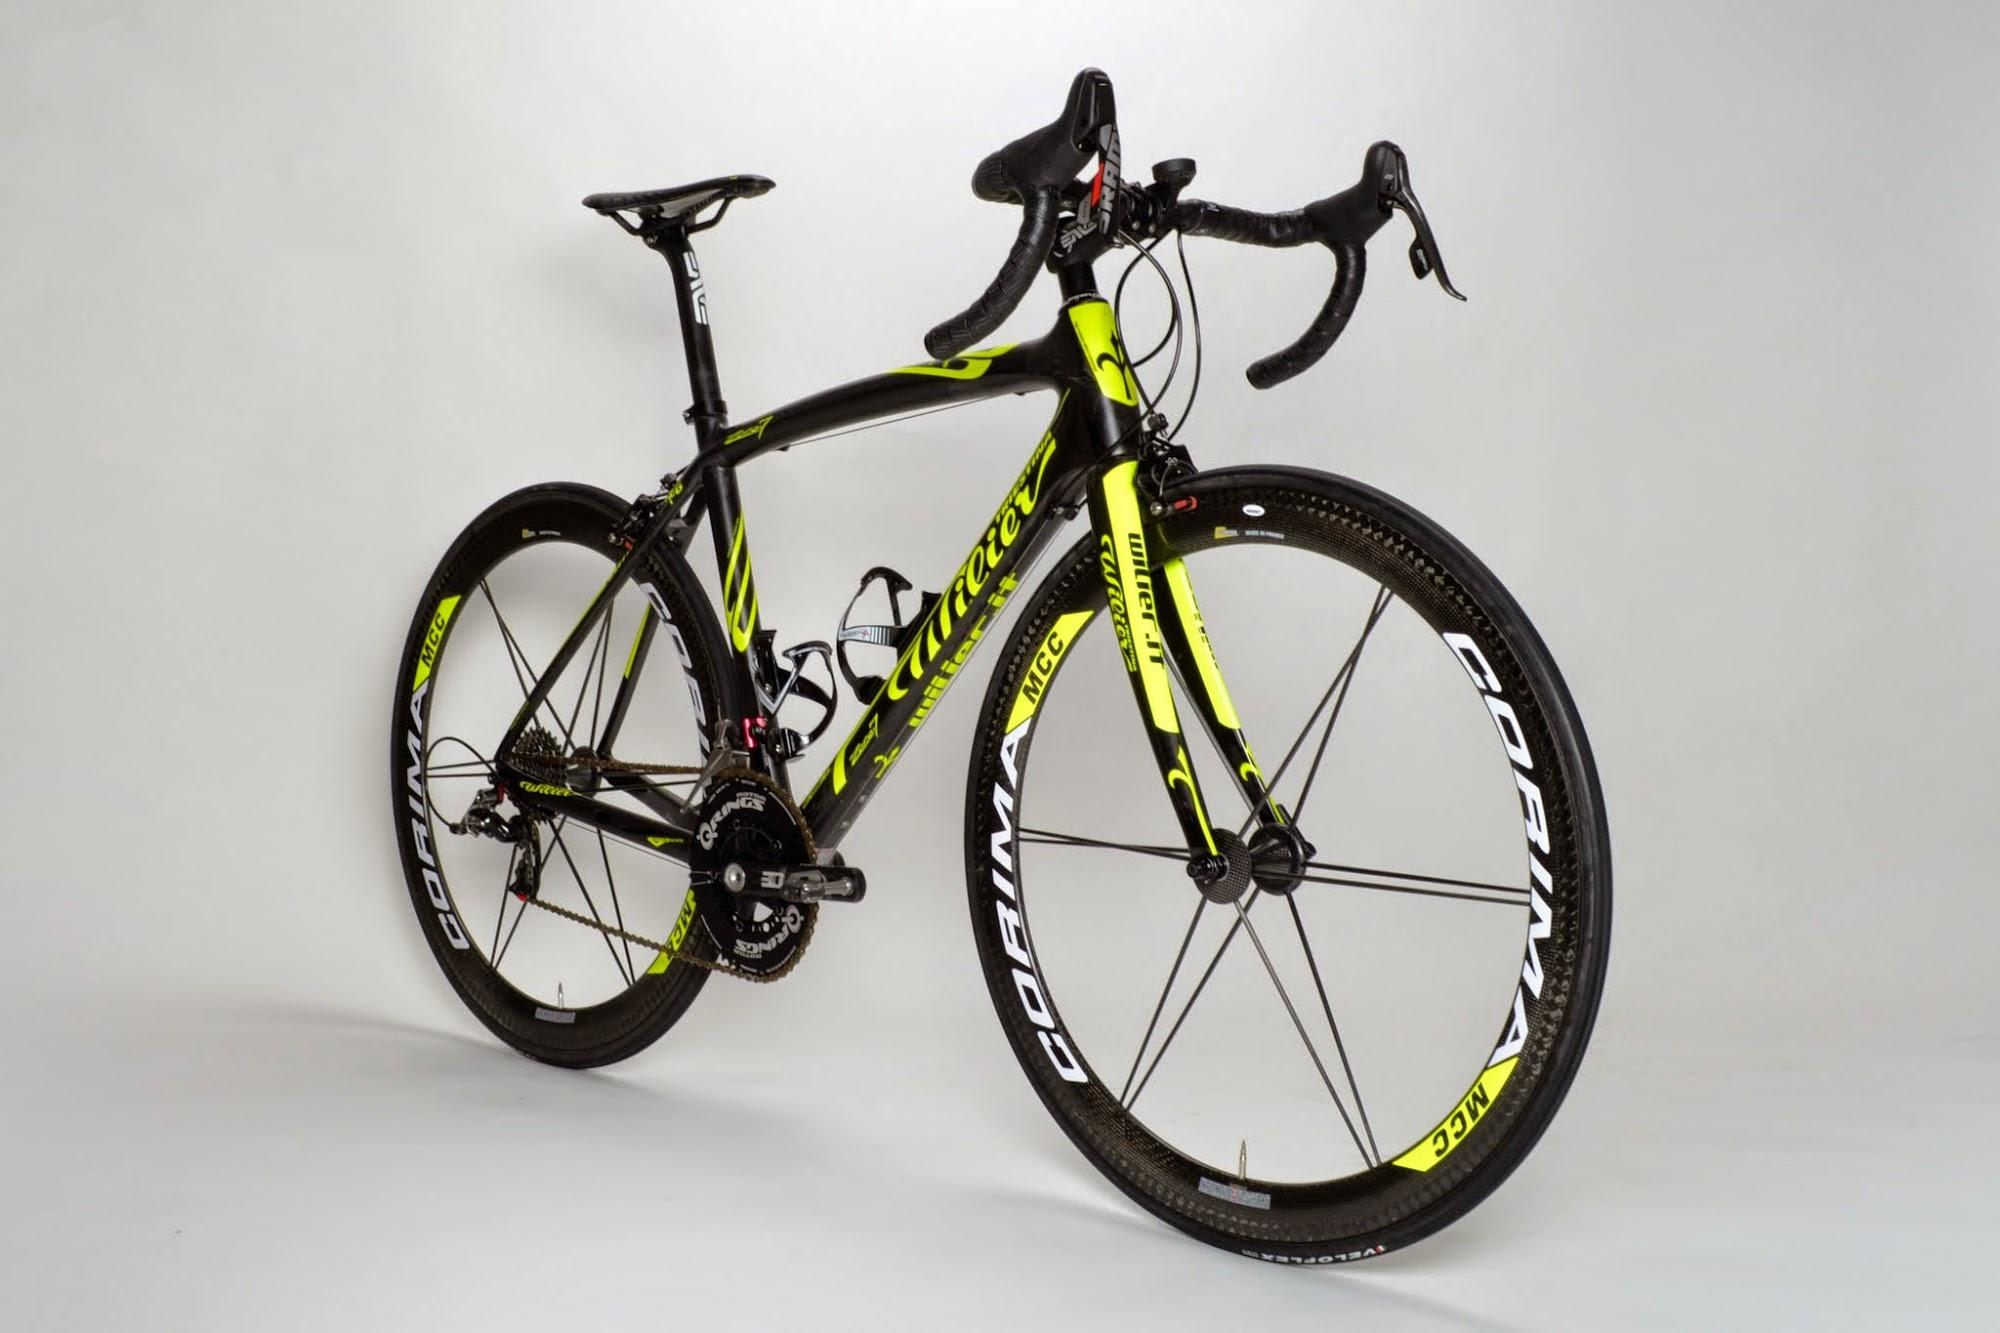 www.twohubs.com: Wilier Triestina Zero.7 SRAM Red 22 Complete Bike at twohubs.com